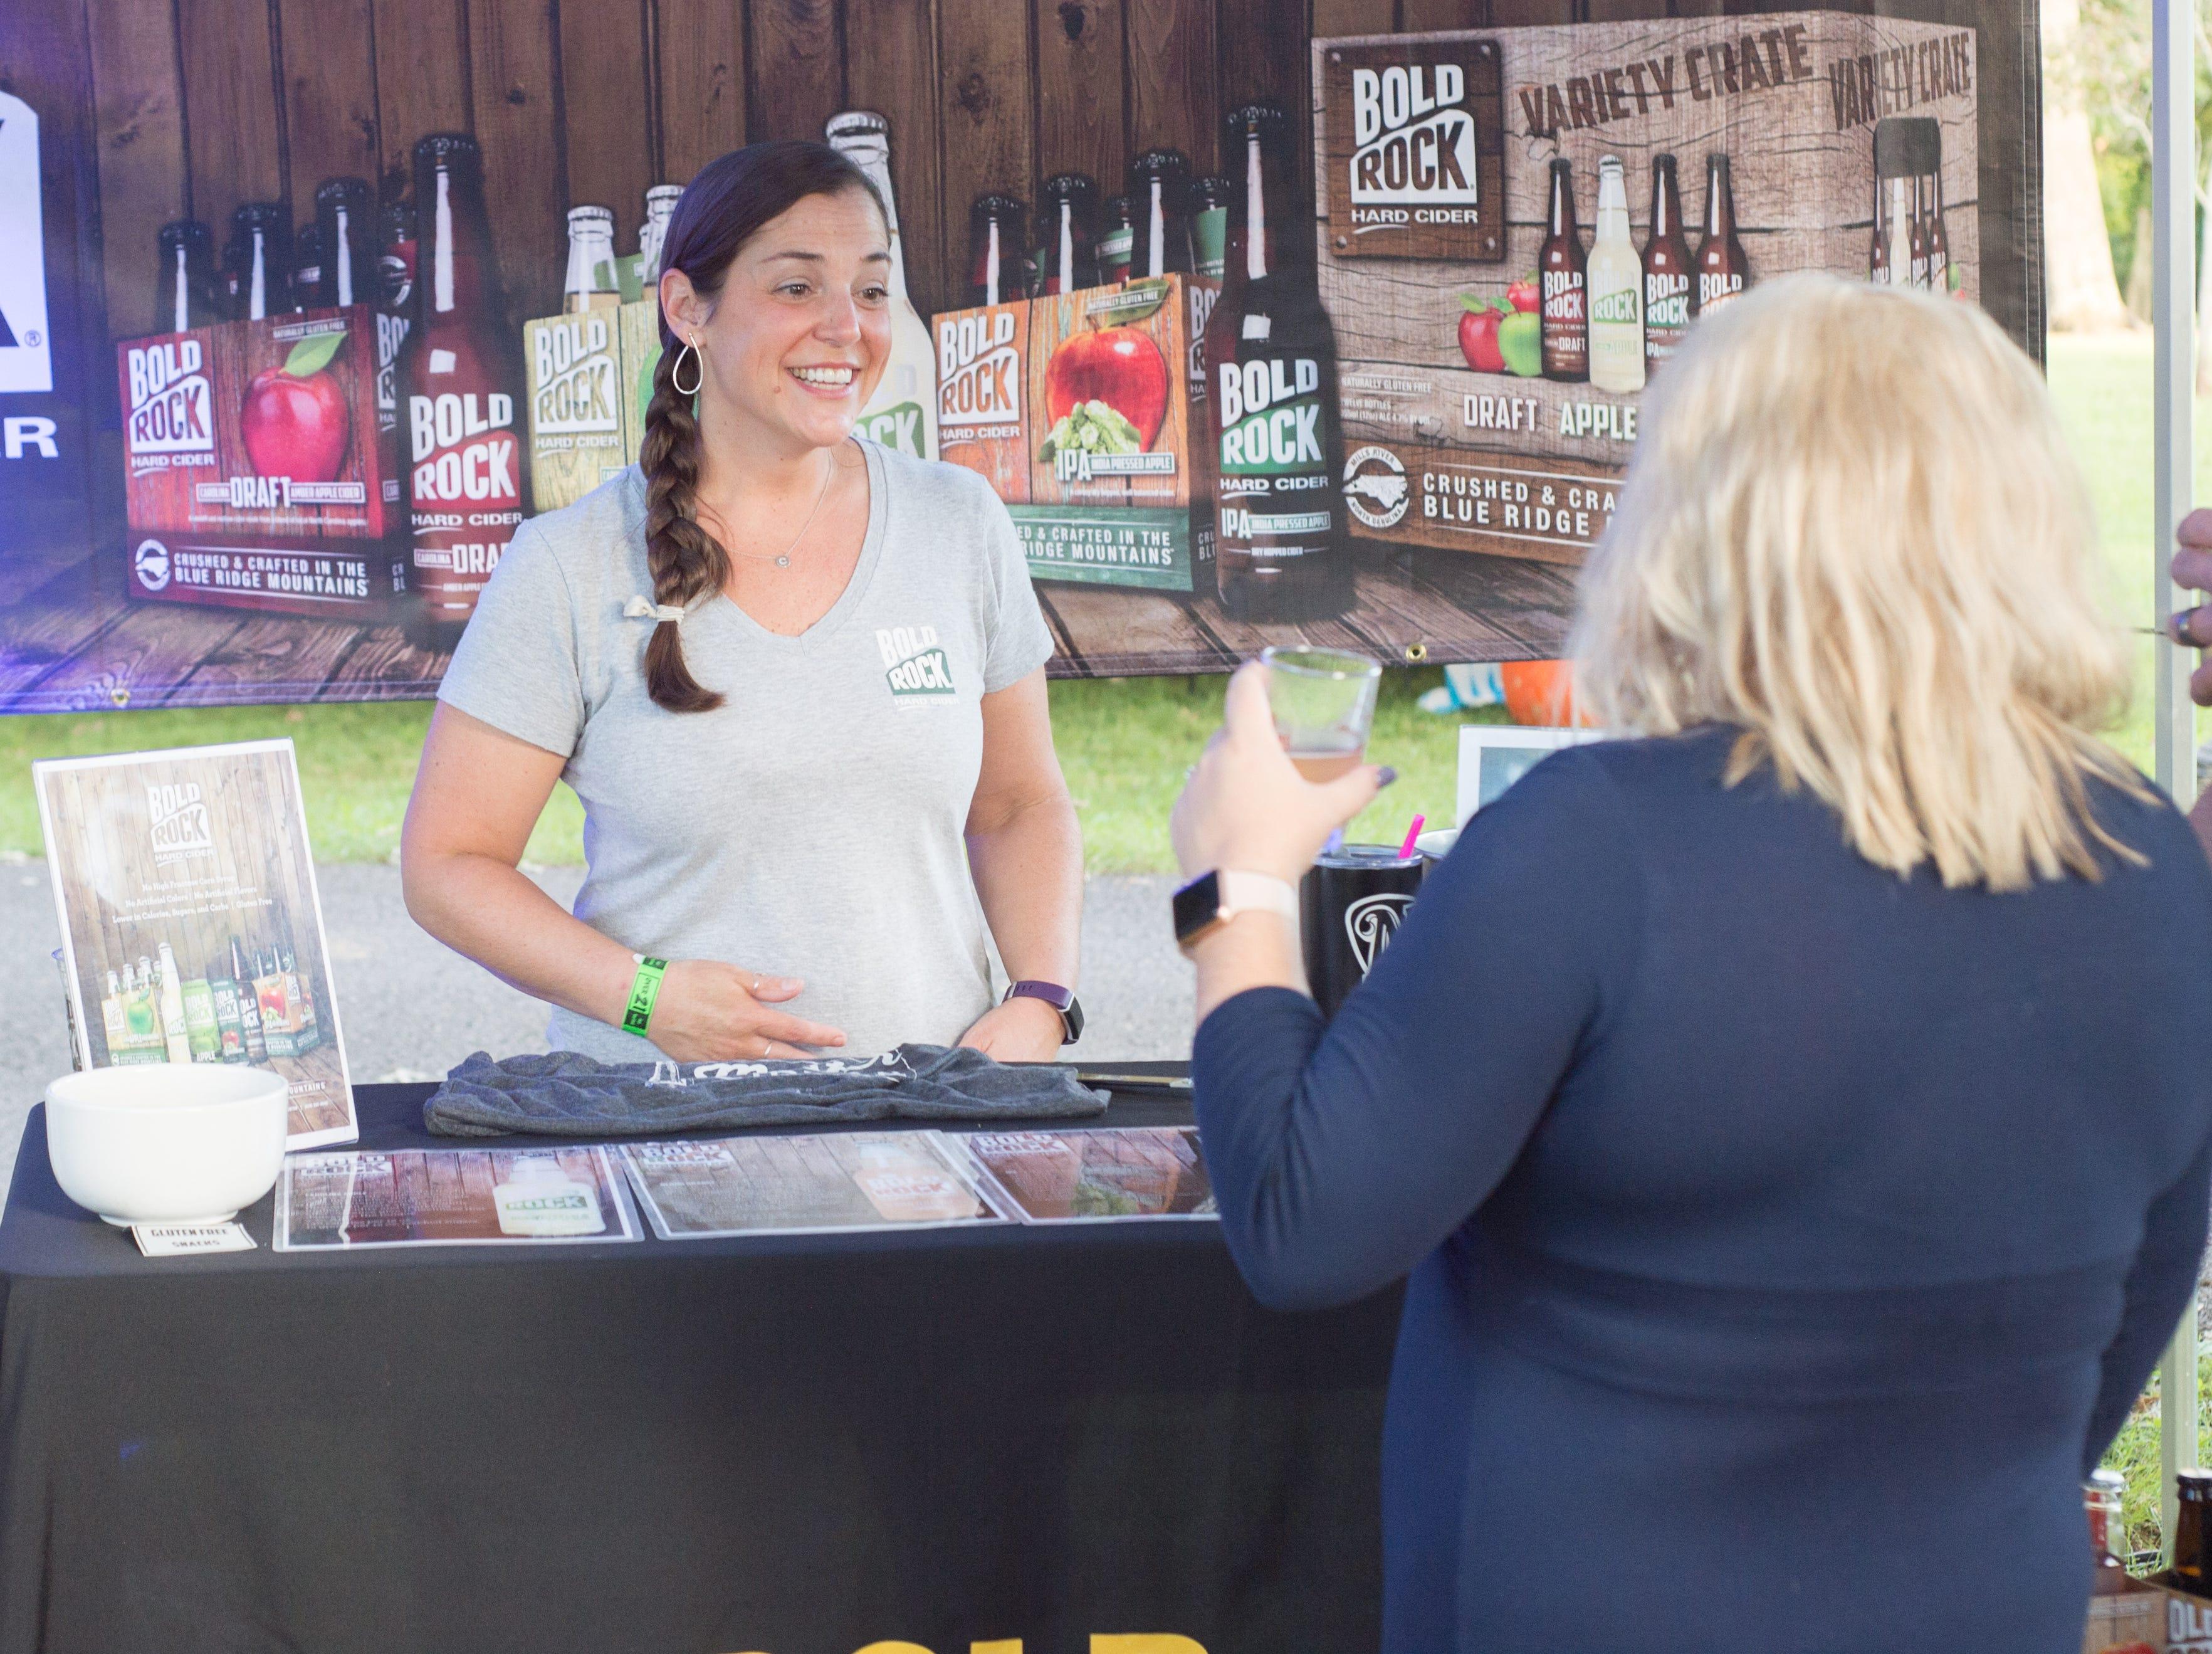 Vendors participate in Oktoberfest at Oaklands Mansion in Murfreesboro on Saturday, Sept. 29.